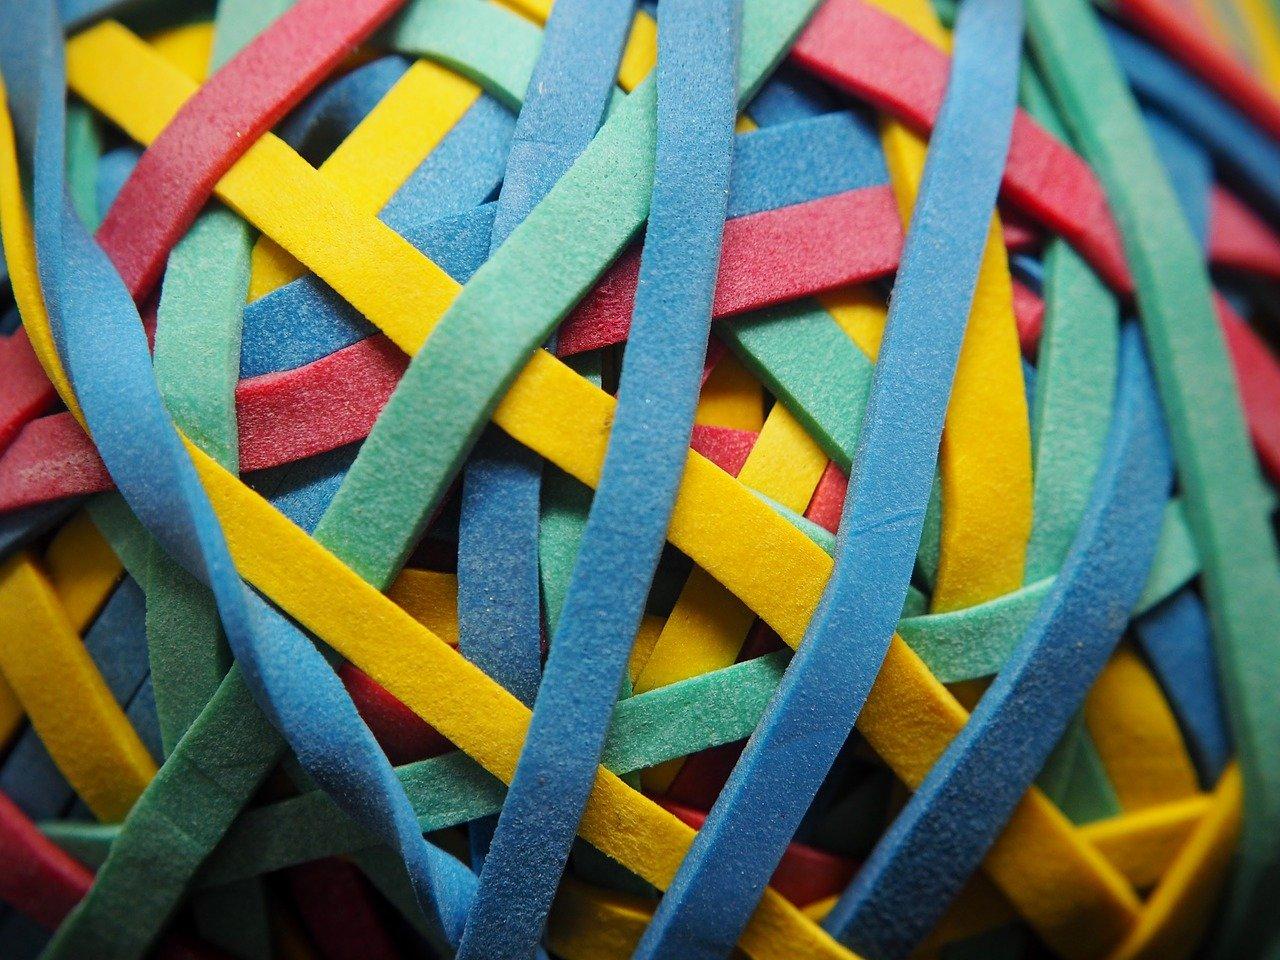 Gummi Schnürsenkel